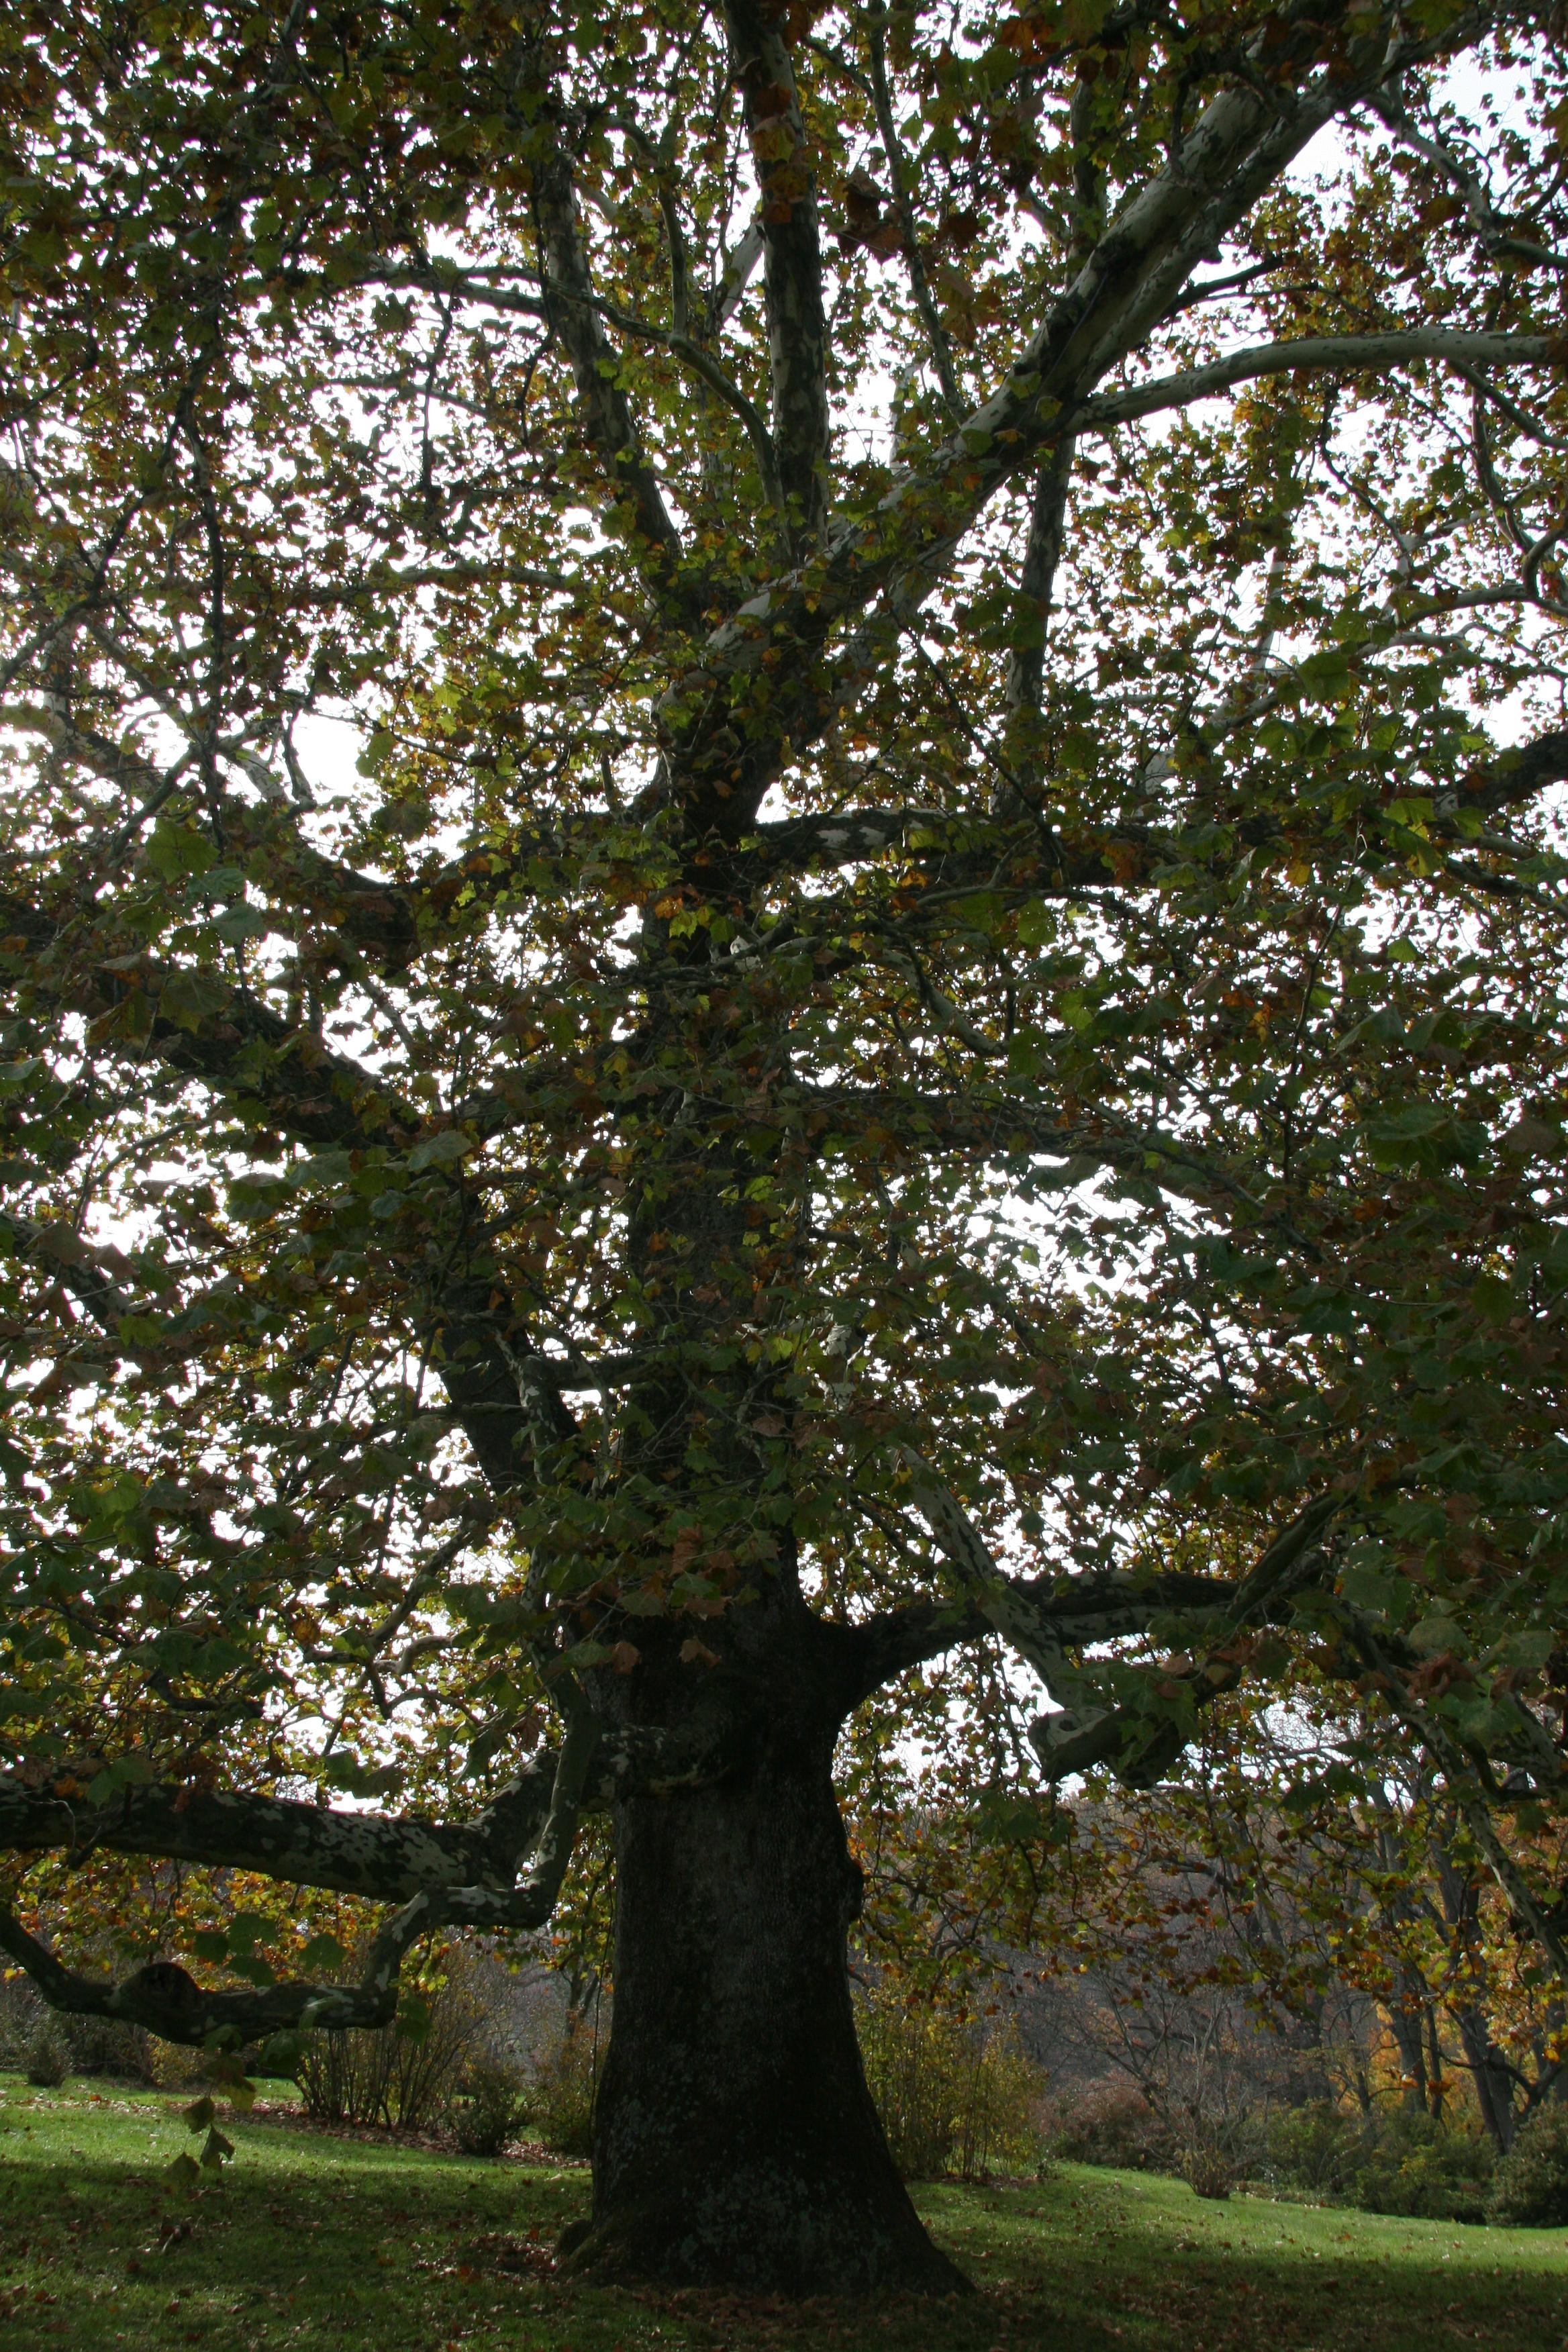 London Planetree Delaware Trees